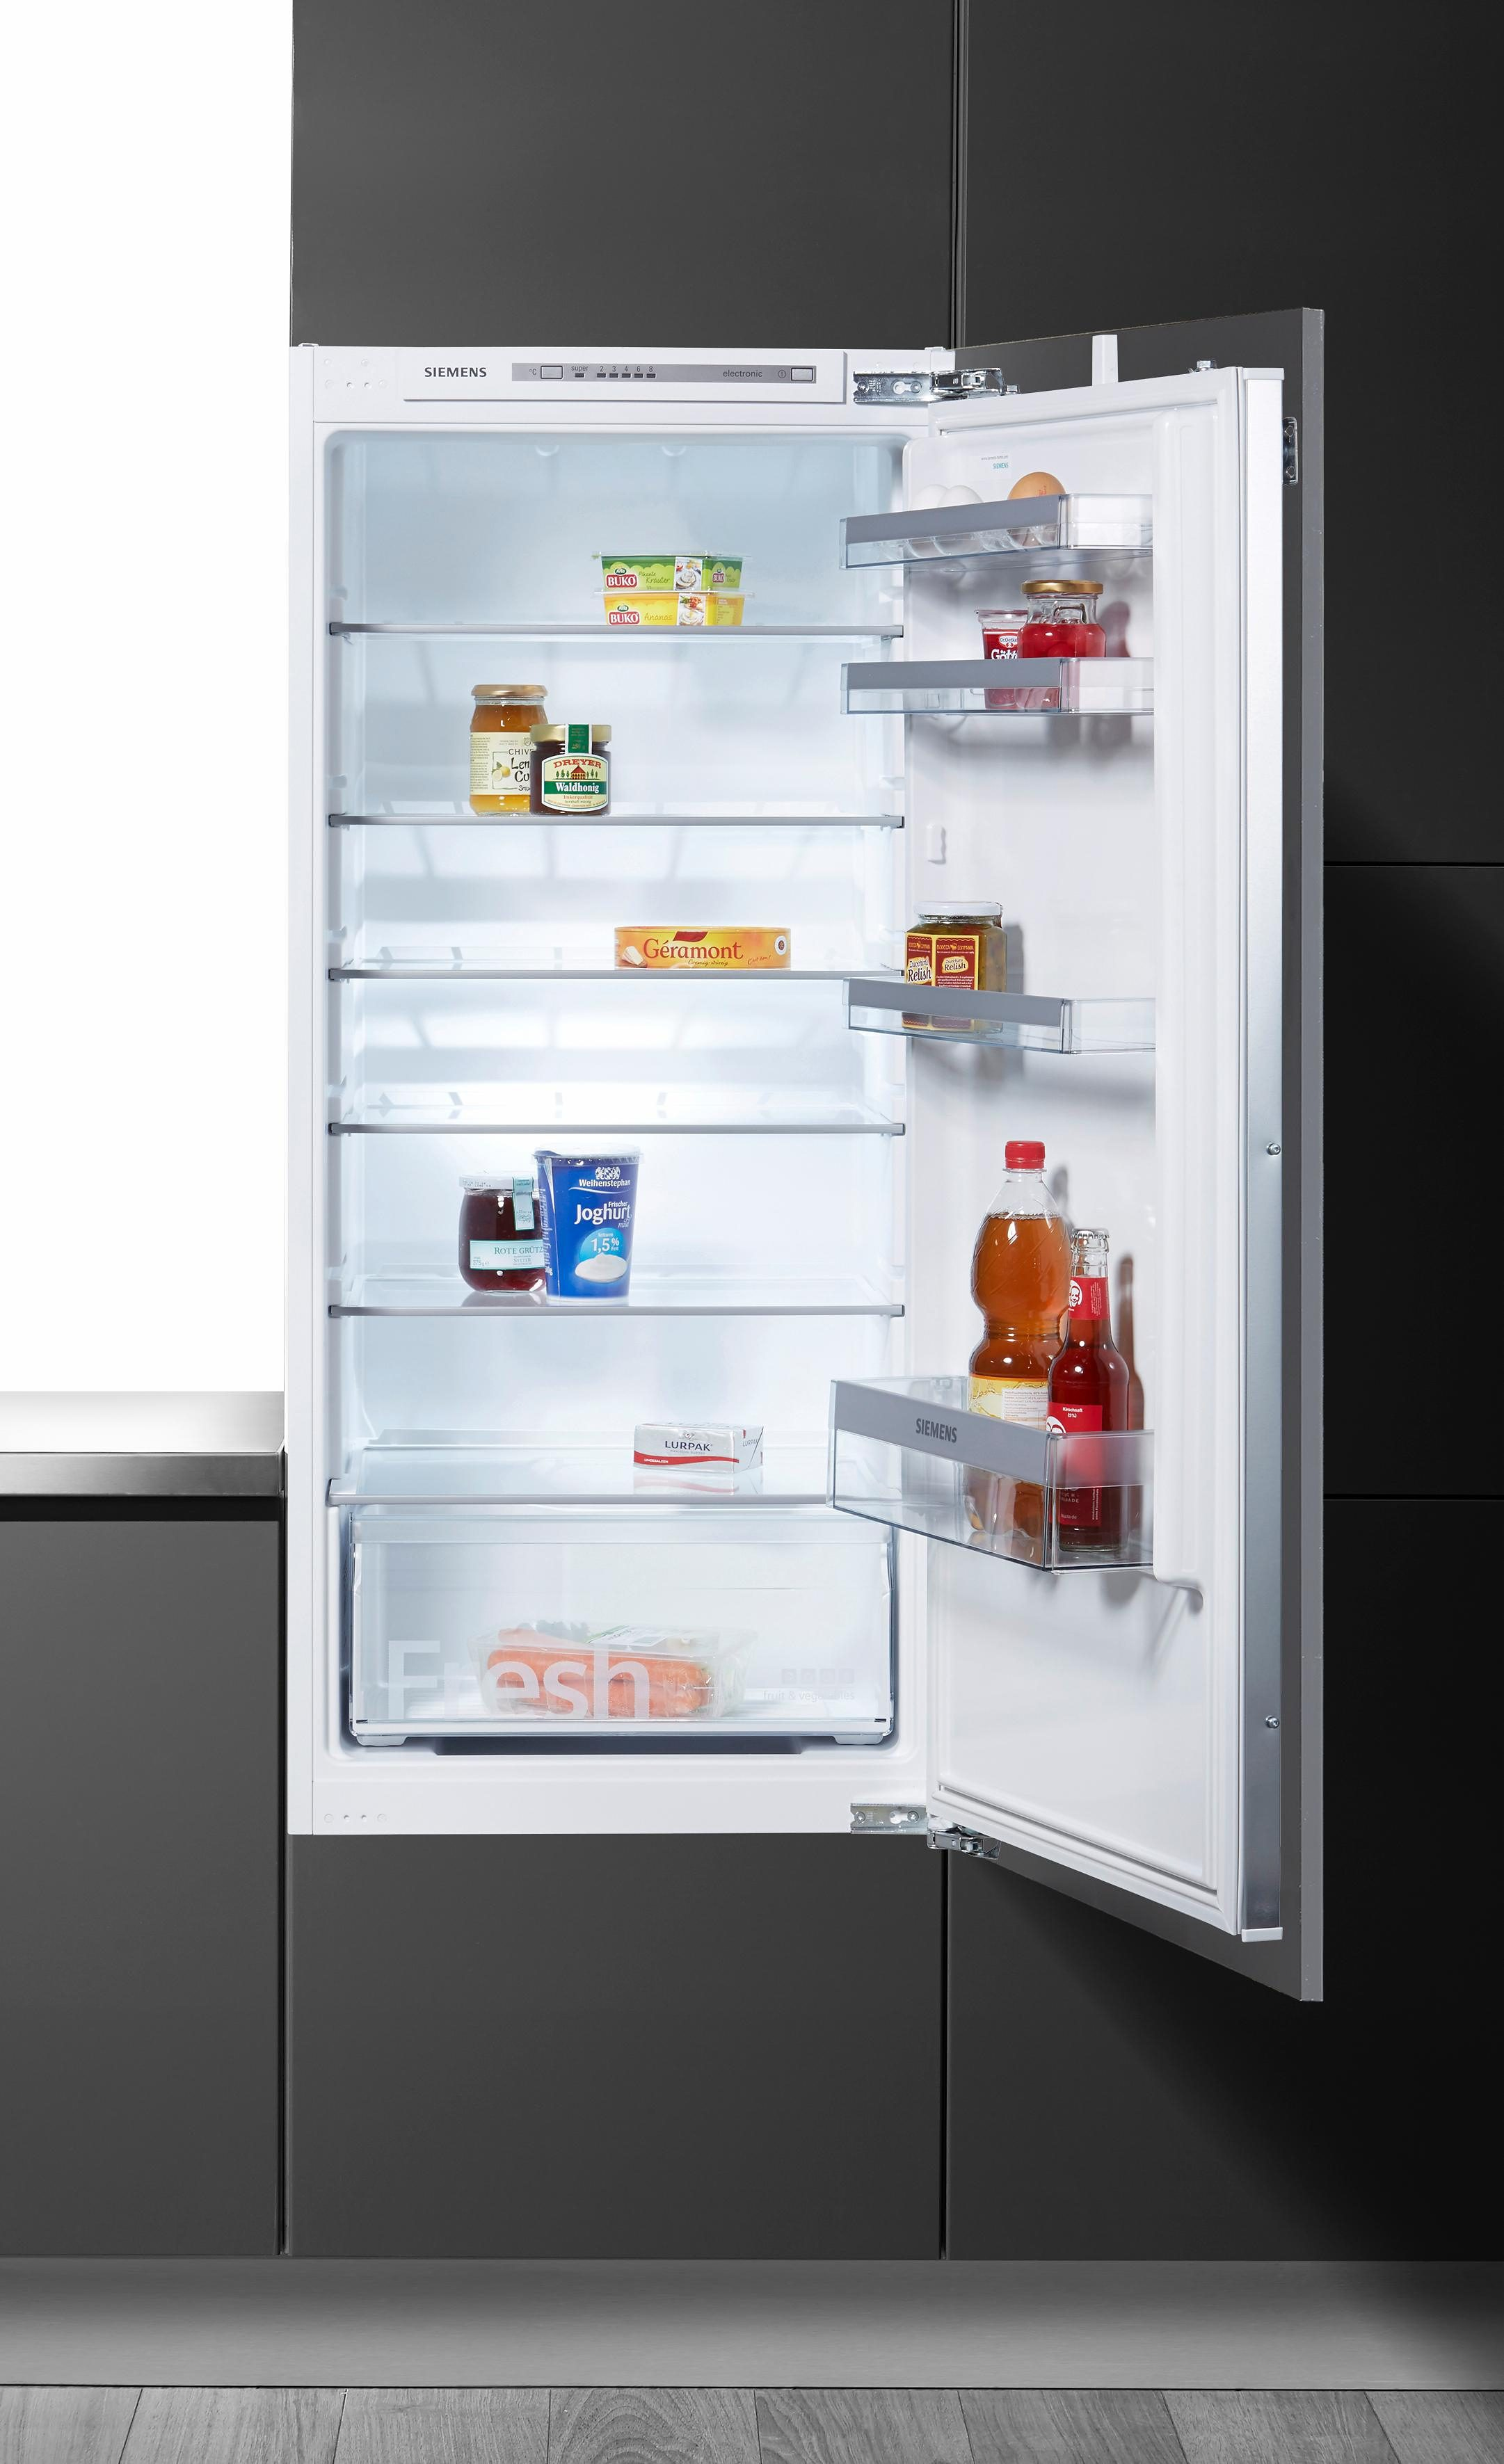 Siemens Einbau-Kühlautomat KI41RVF30, A++, 122,1 cm, vollintegrierbar